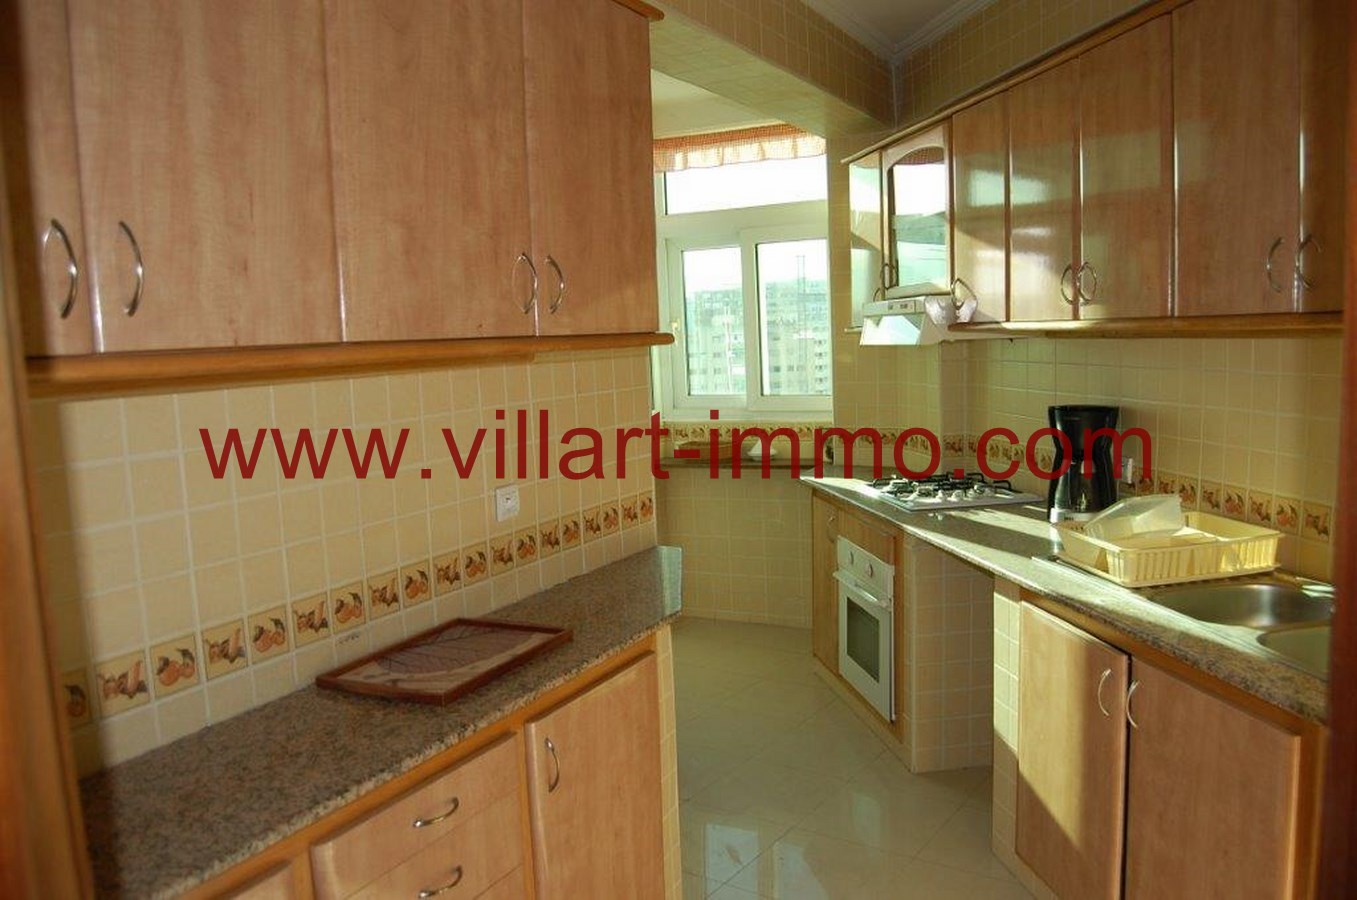 6-Location-Appartement-Non meublé-Tanger-Cuisine-L718-Villart immo